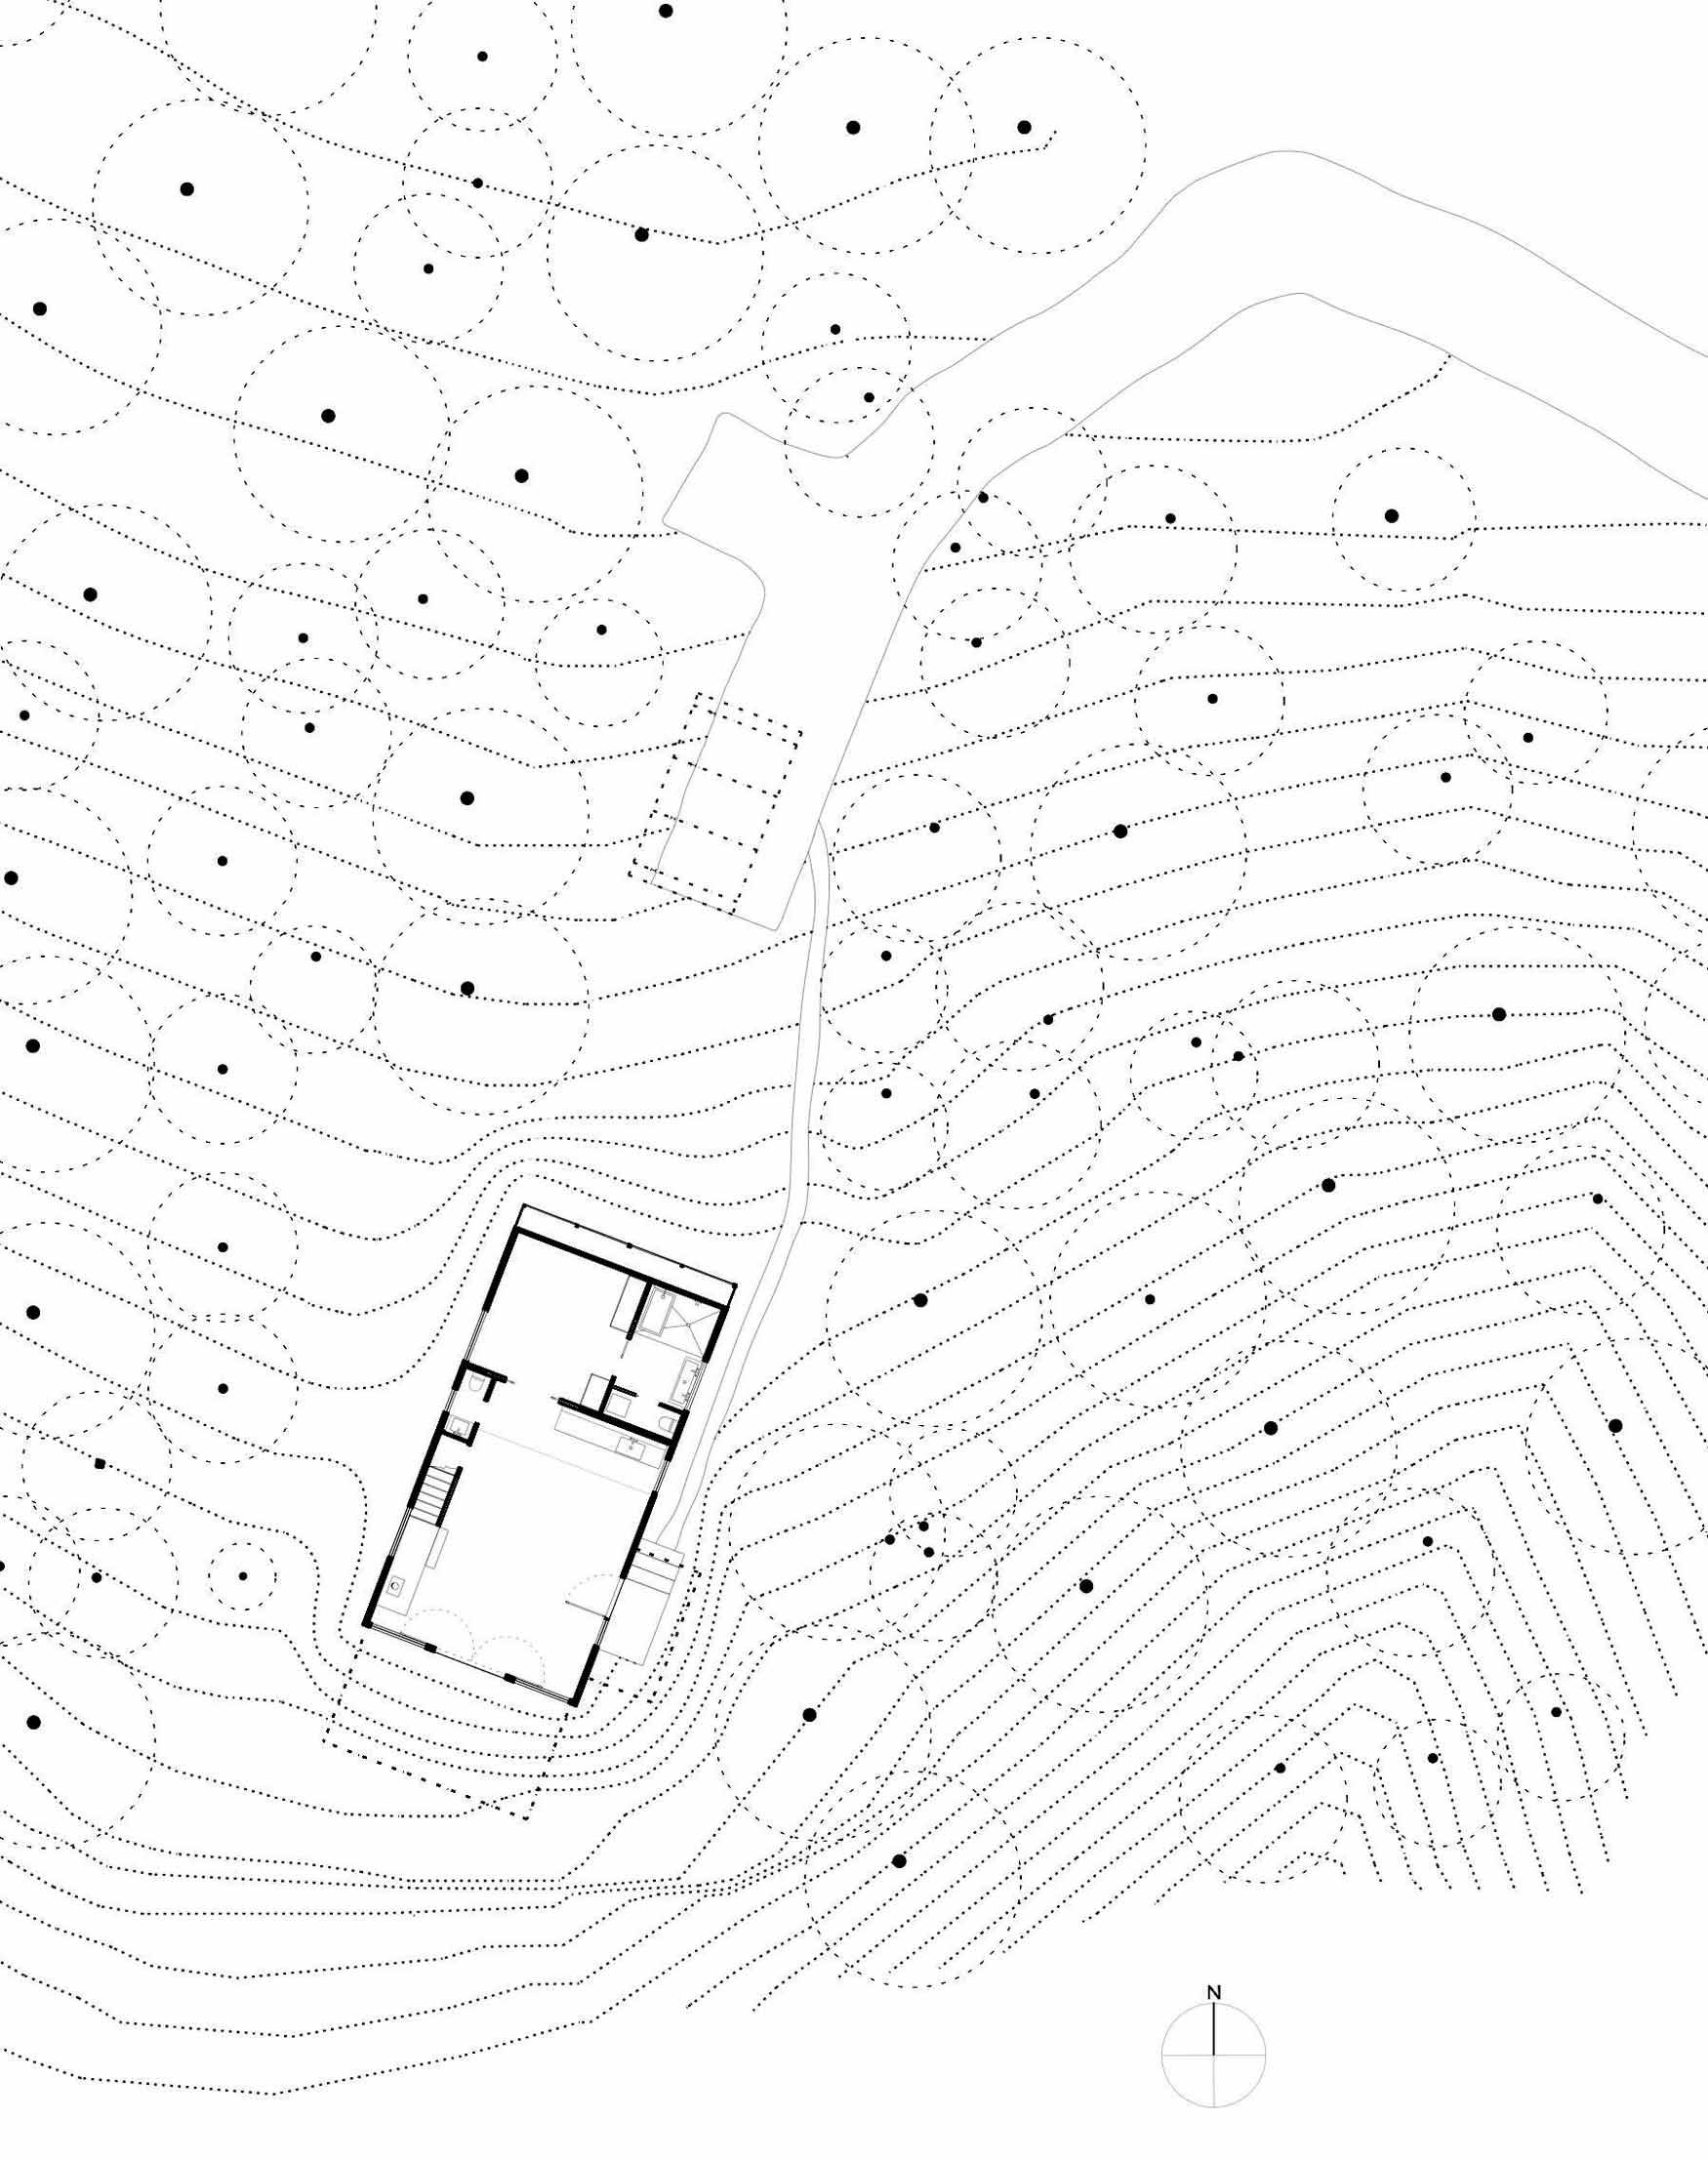 Site Plan, Simple Eco-Friendly Home Perched Above Lake Buchanan, Texas